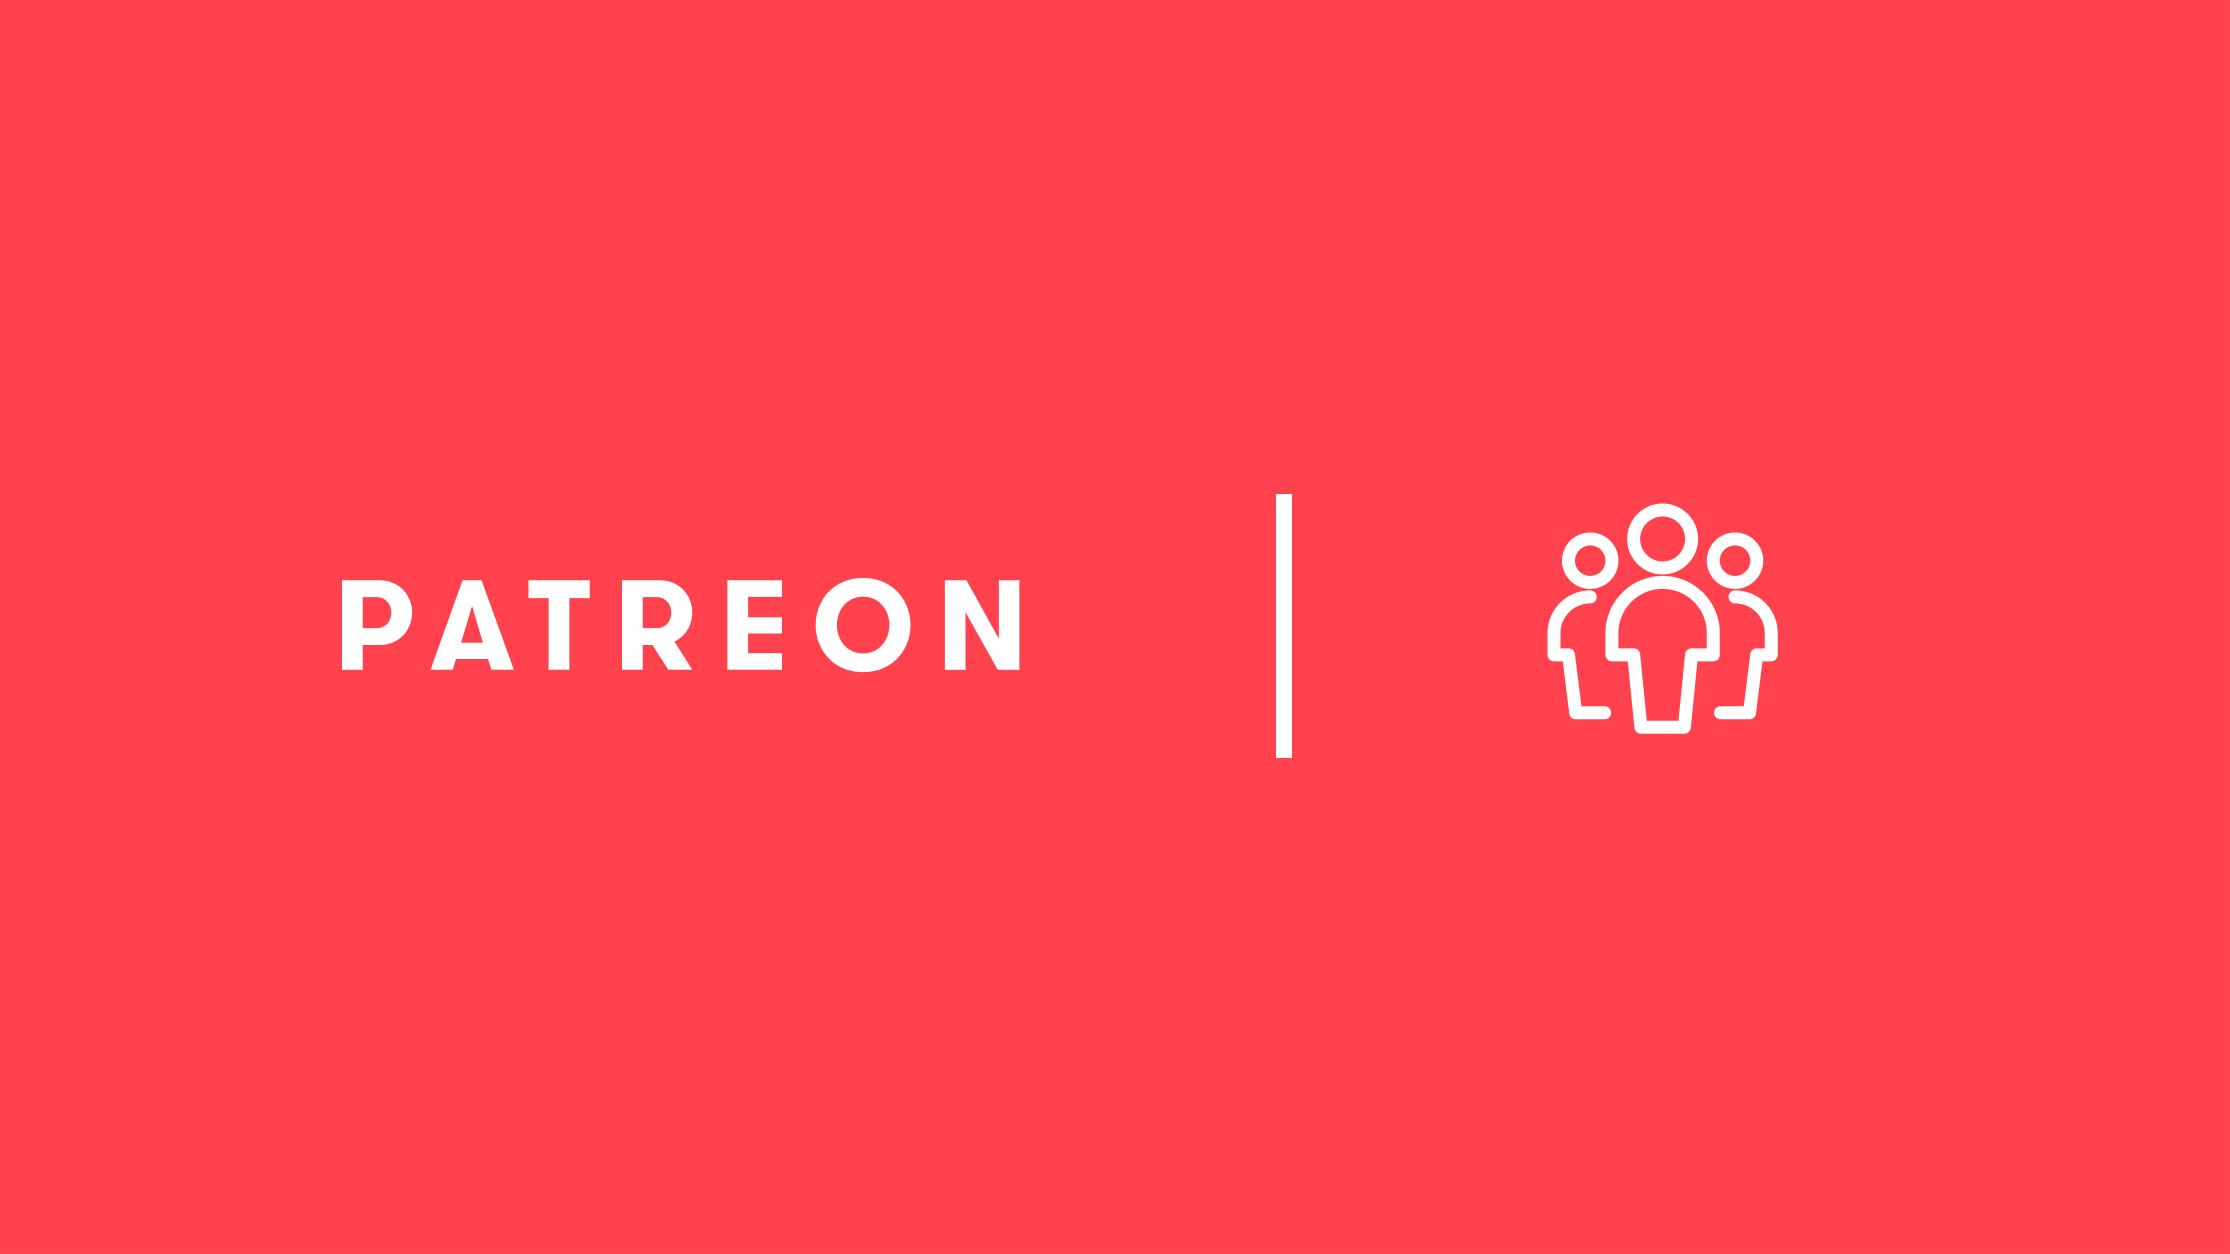 Patreon Team Image